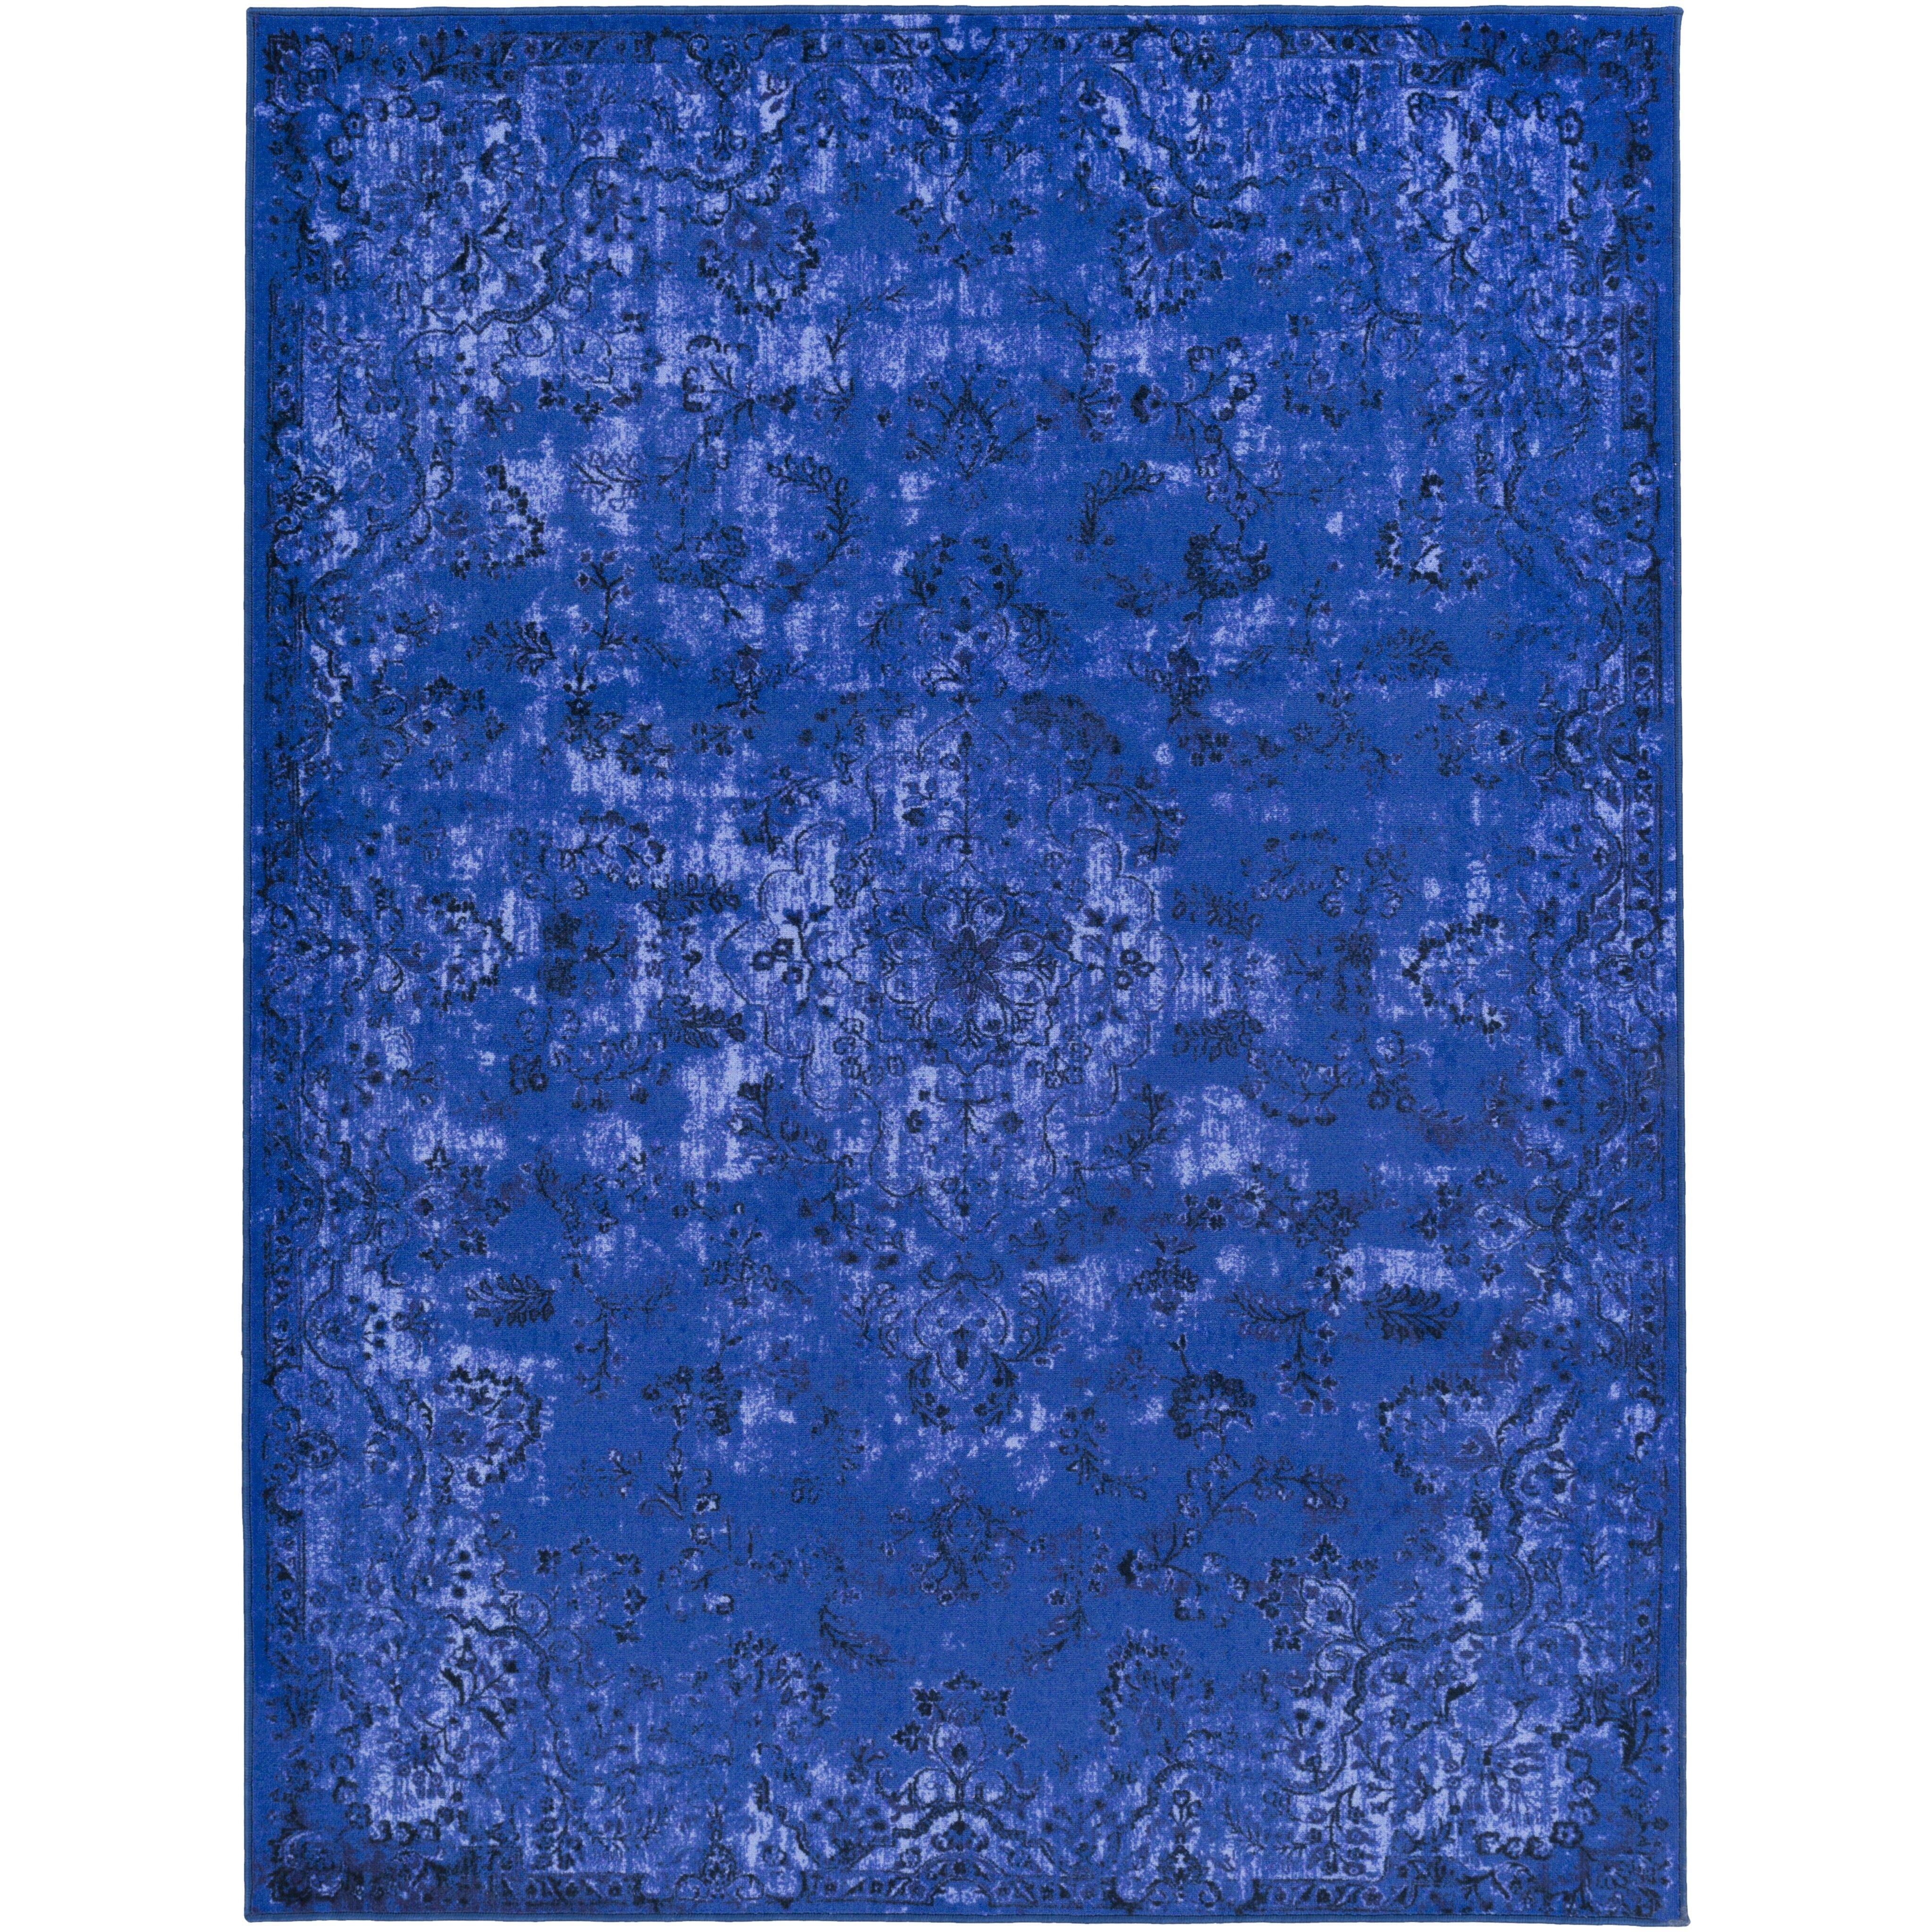 Saturn Austin Royal Blue Area Rug by Artistic Weavers